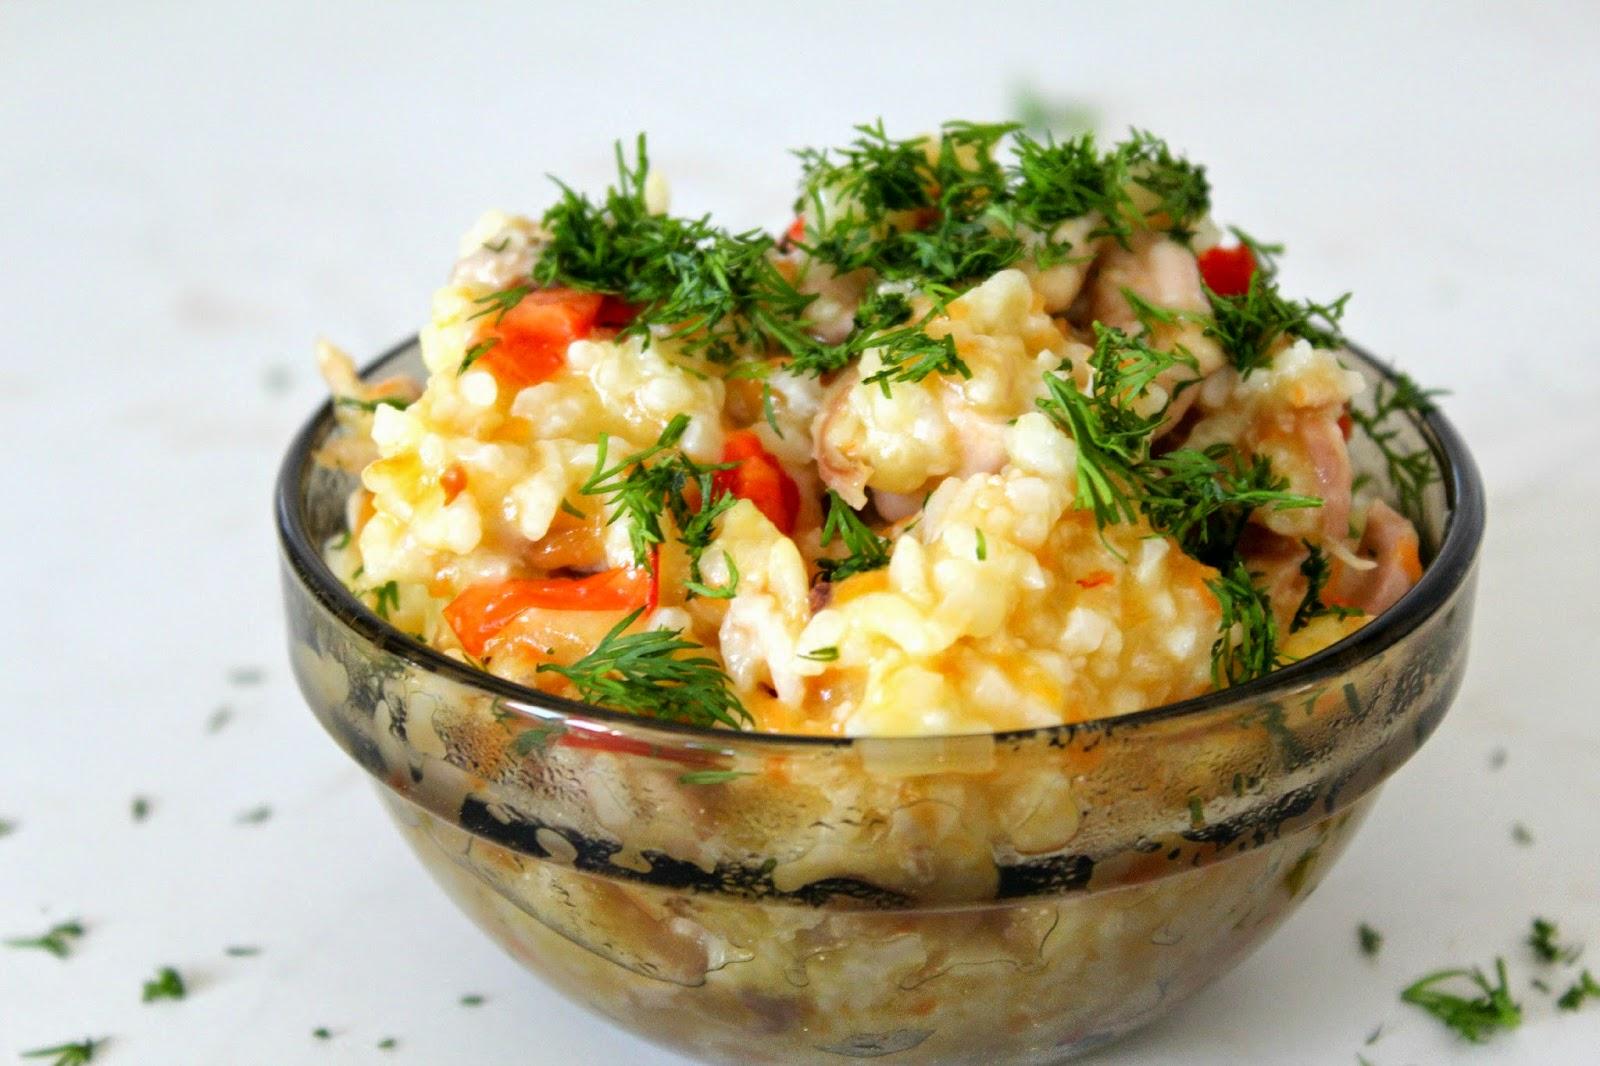 http://theseamanmom.com/chicken-rice-pilaf-recipe/